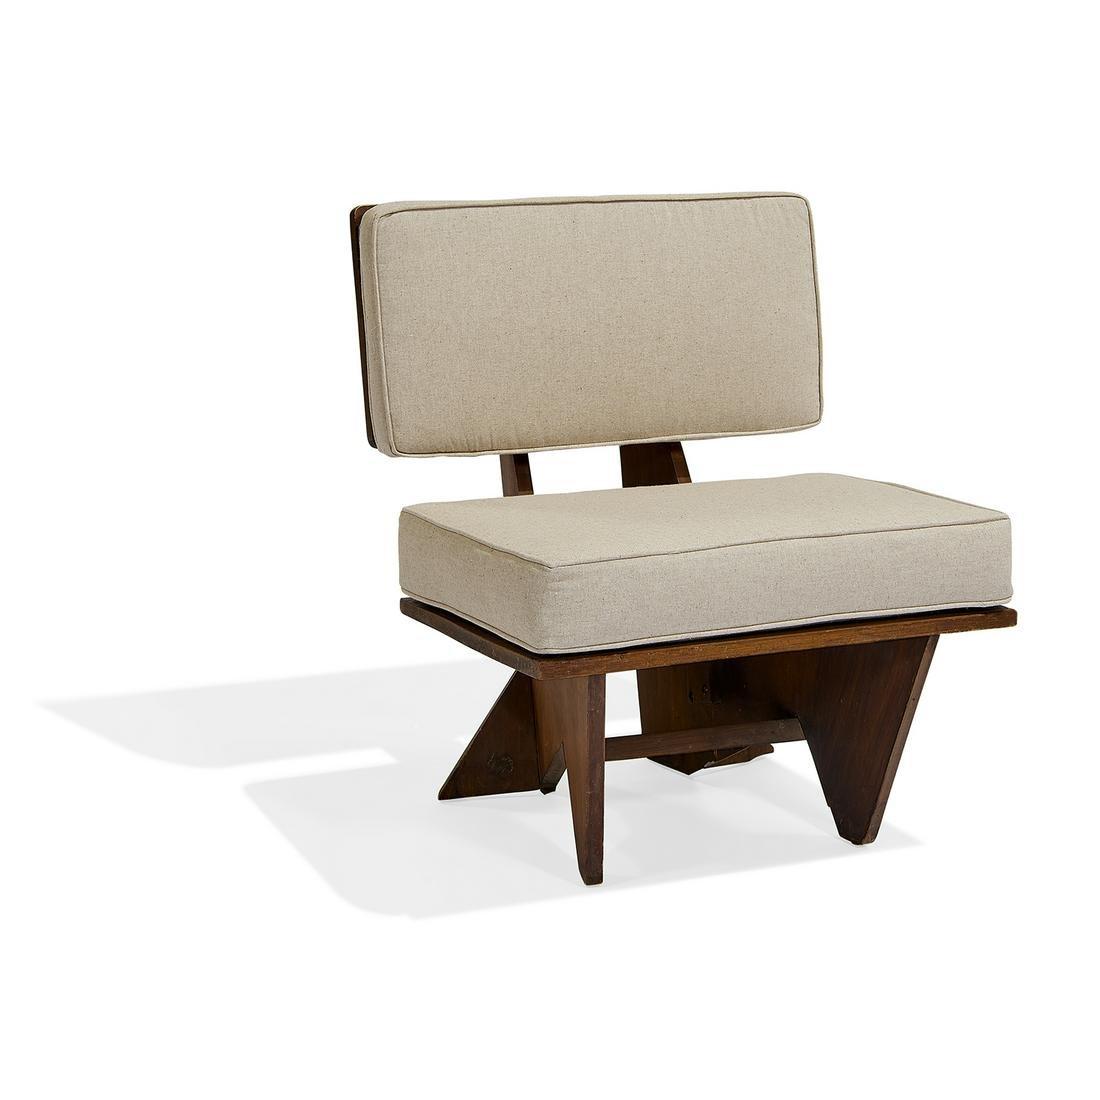 Frank Lloyd Wright for the Winn House chair